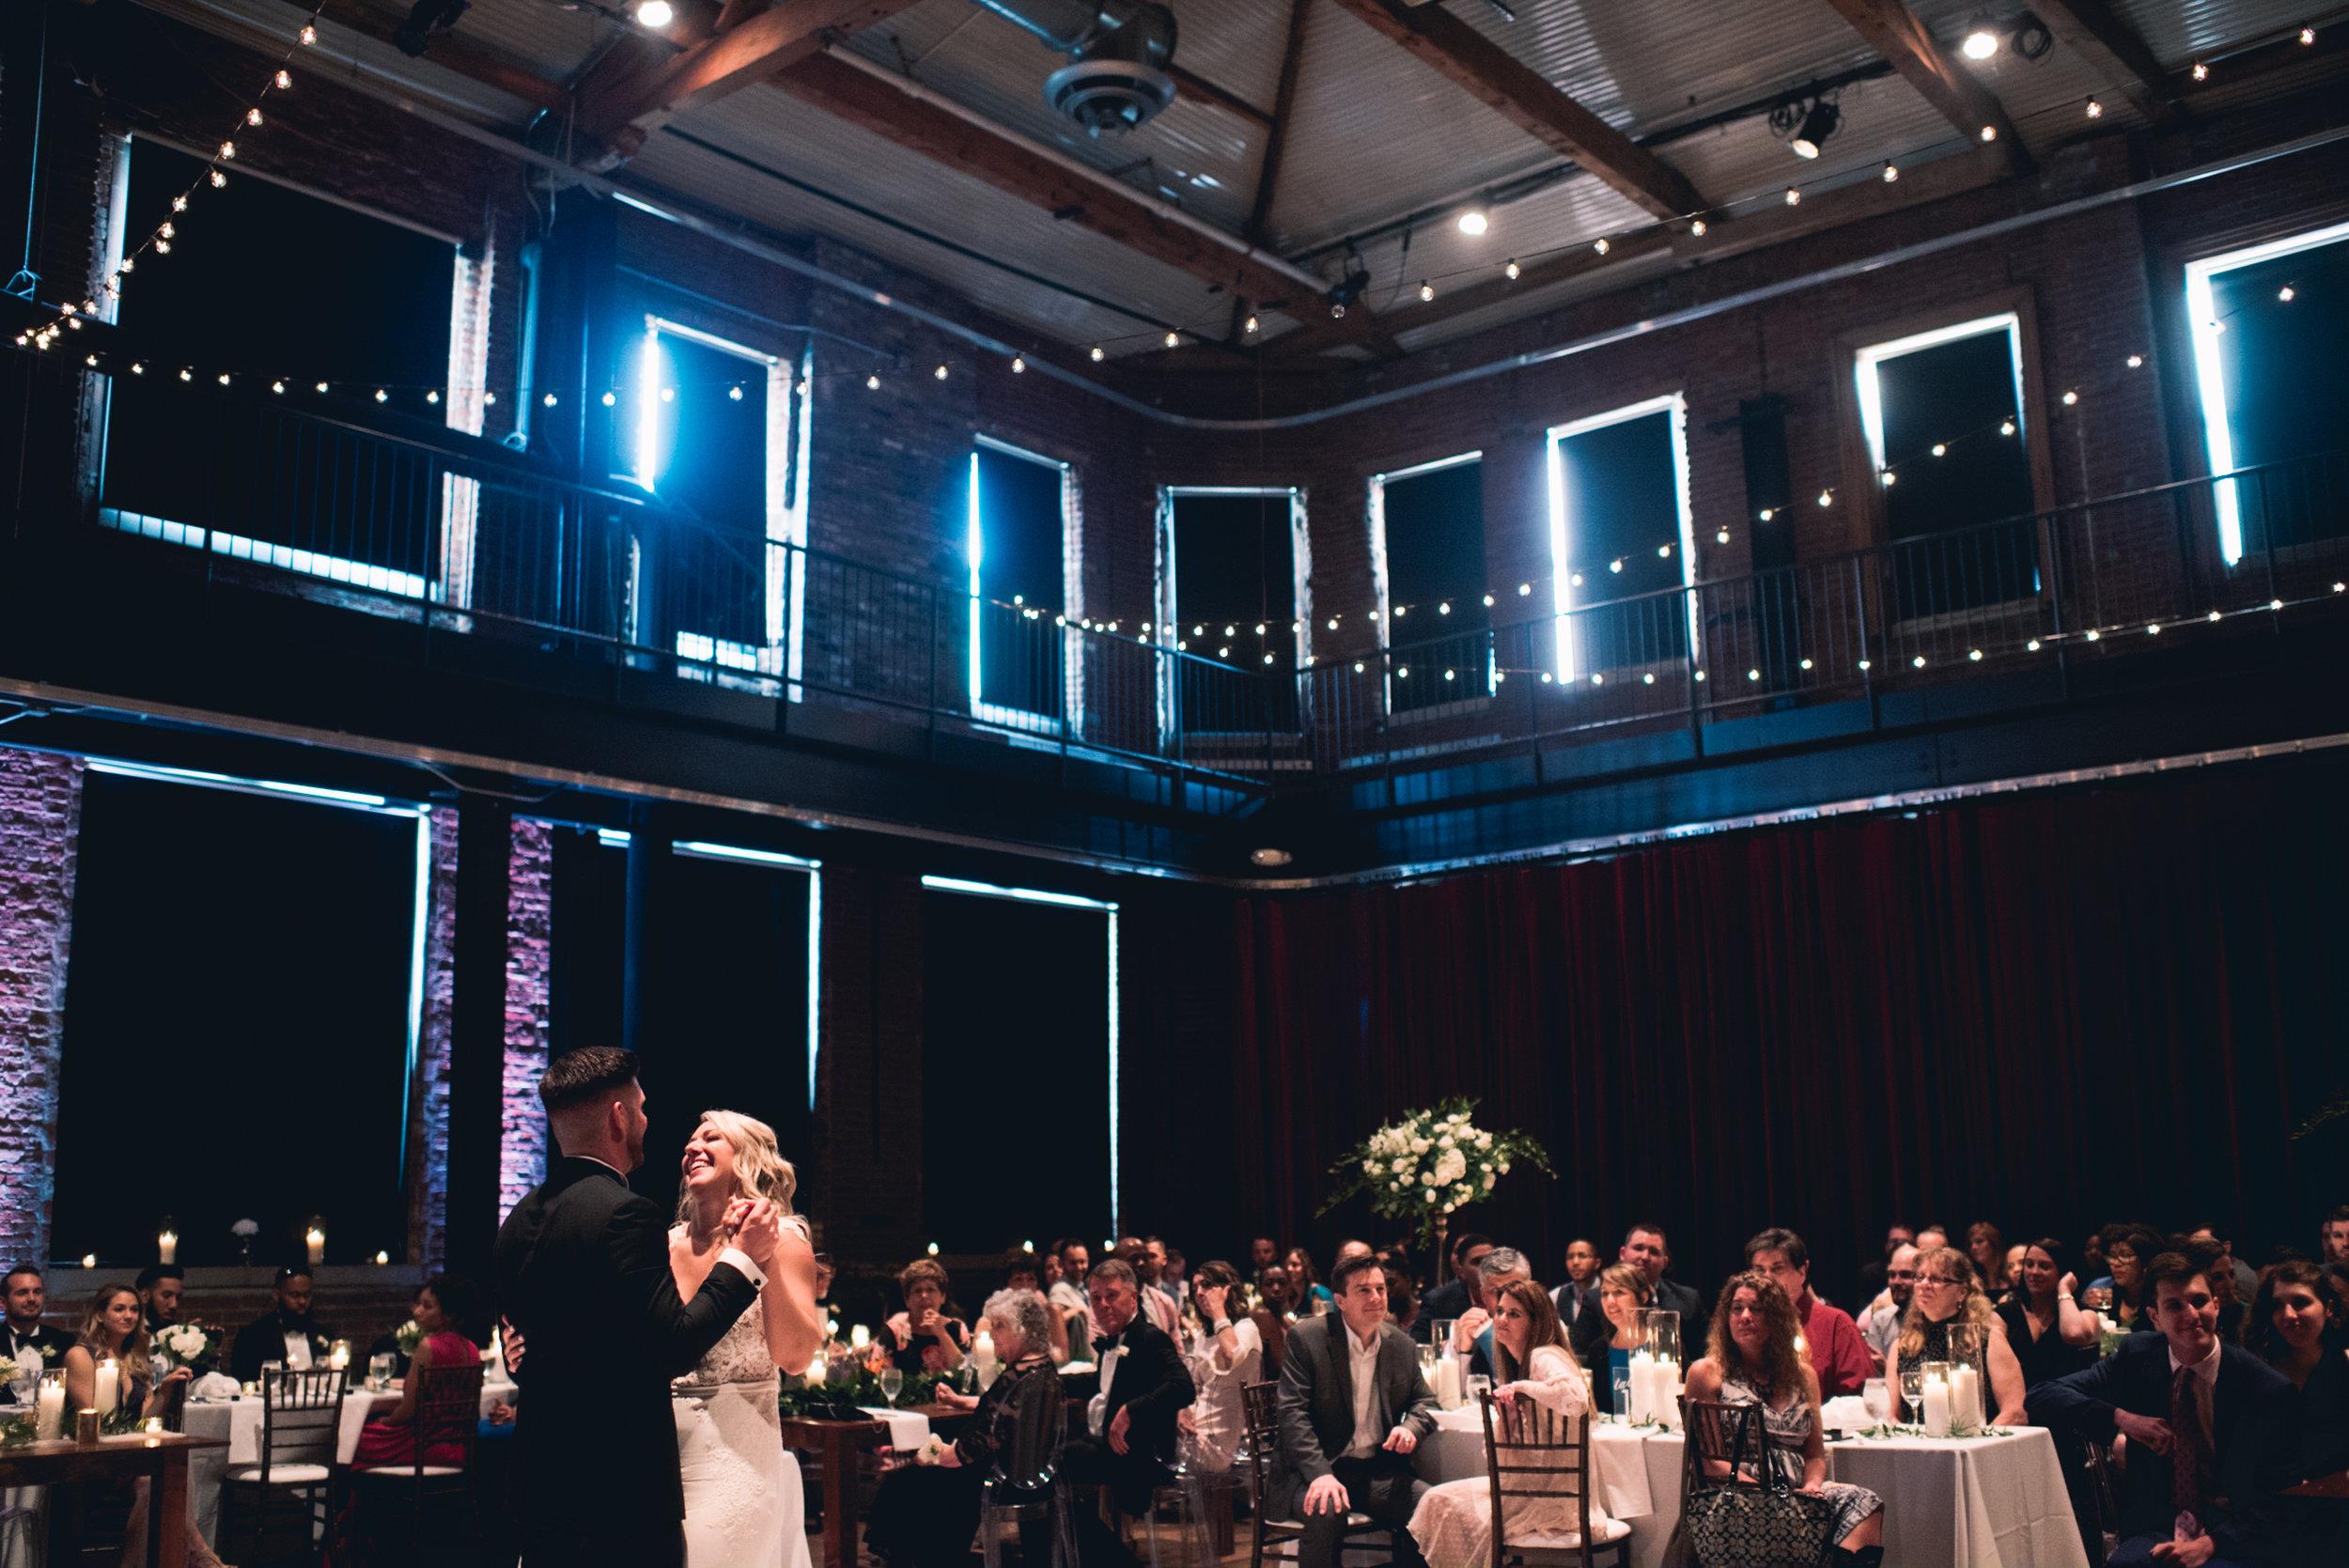 Pittsburgh Pennsylvania New York NYC Wedding Photographer Photojournalist Luxury Downtown Opera - Stirpe 1334.jpg